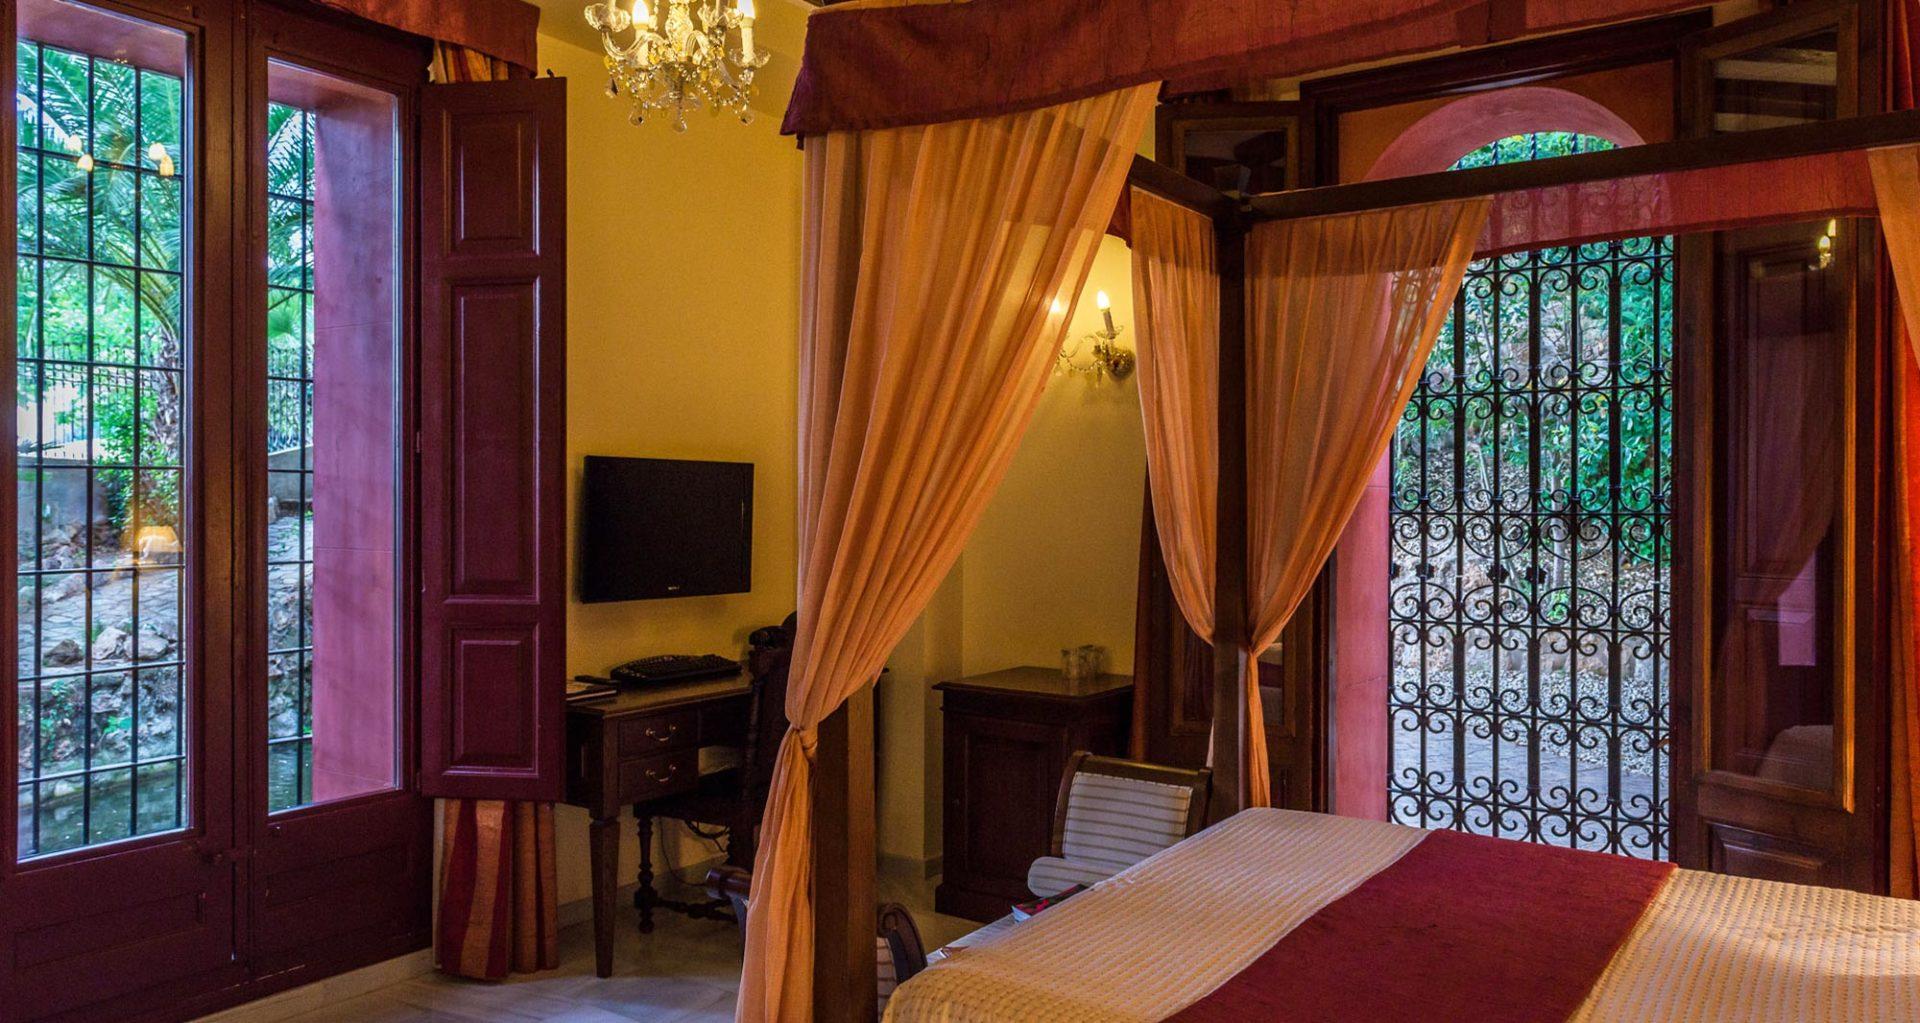 Hotel Villa Retiro Xerta Ebre escapada romántica de lujo